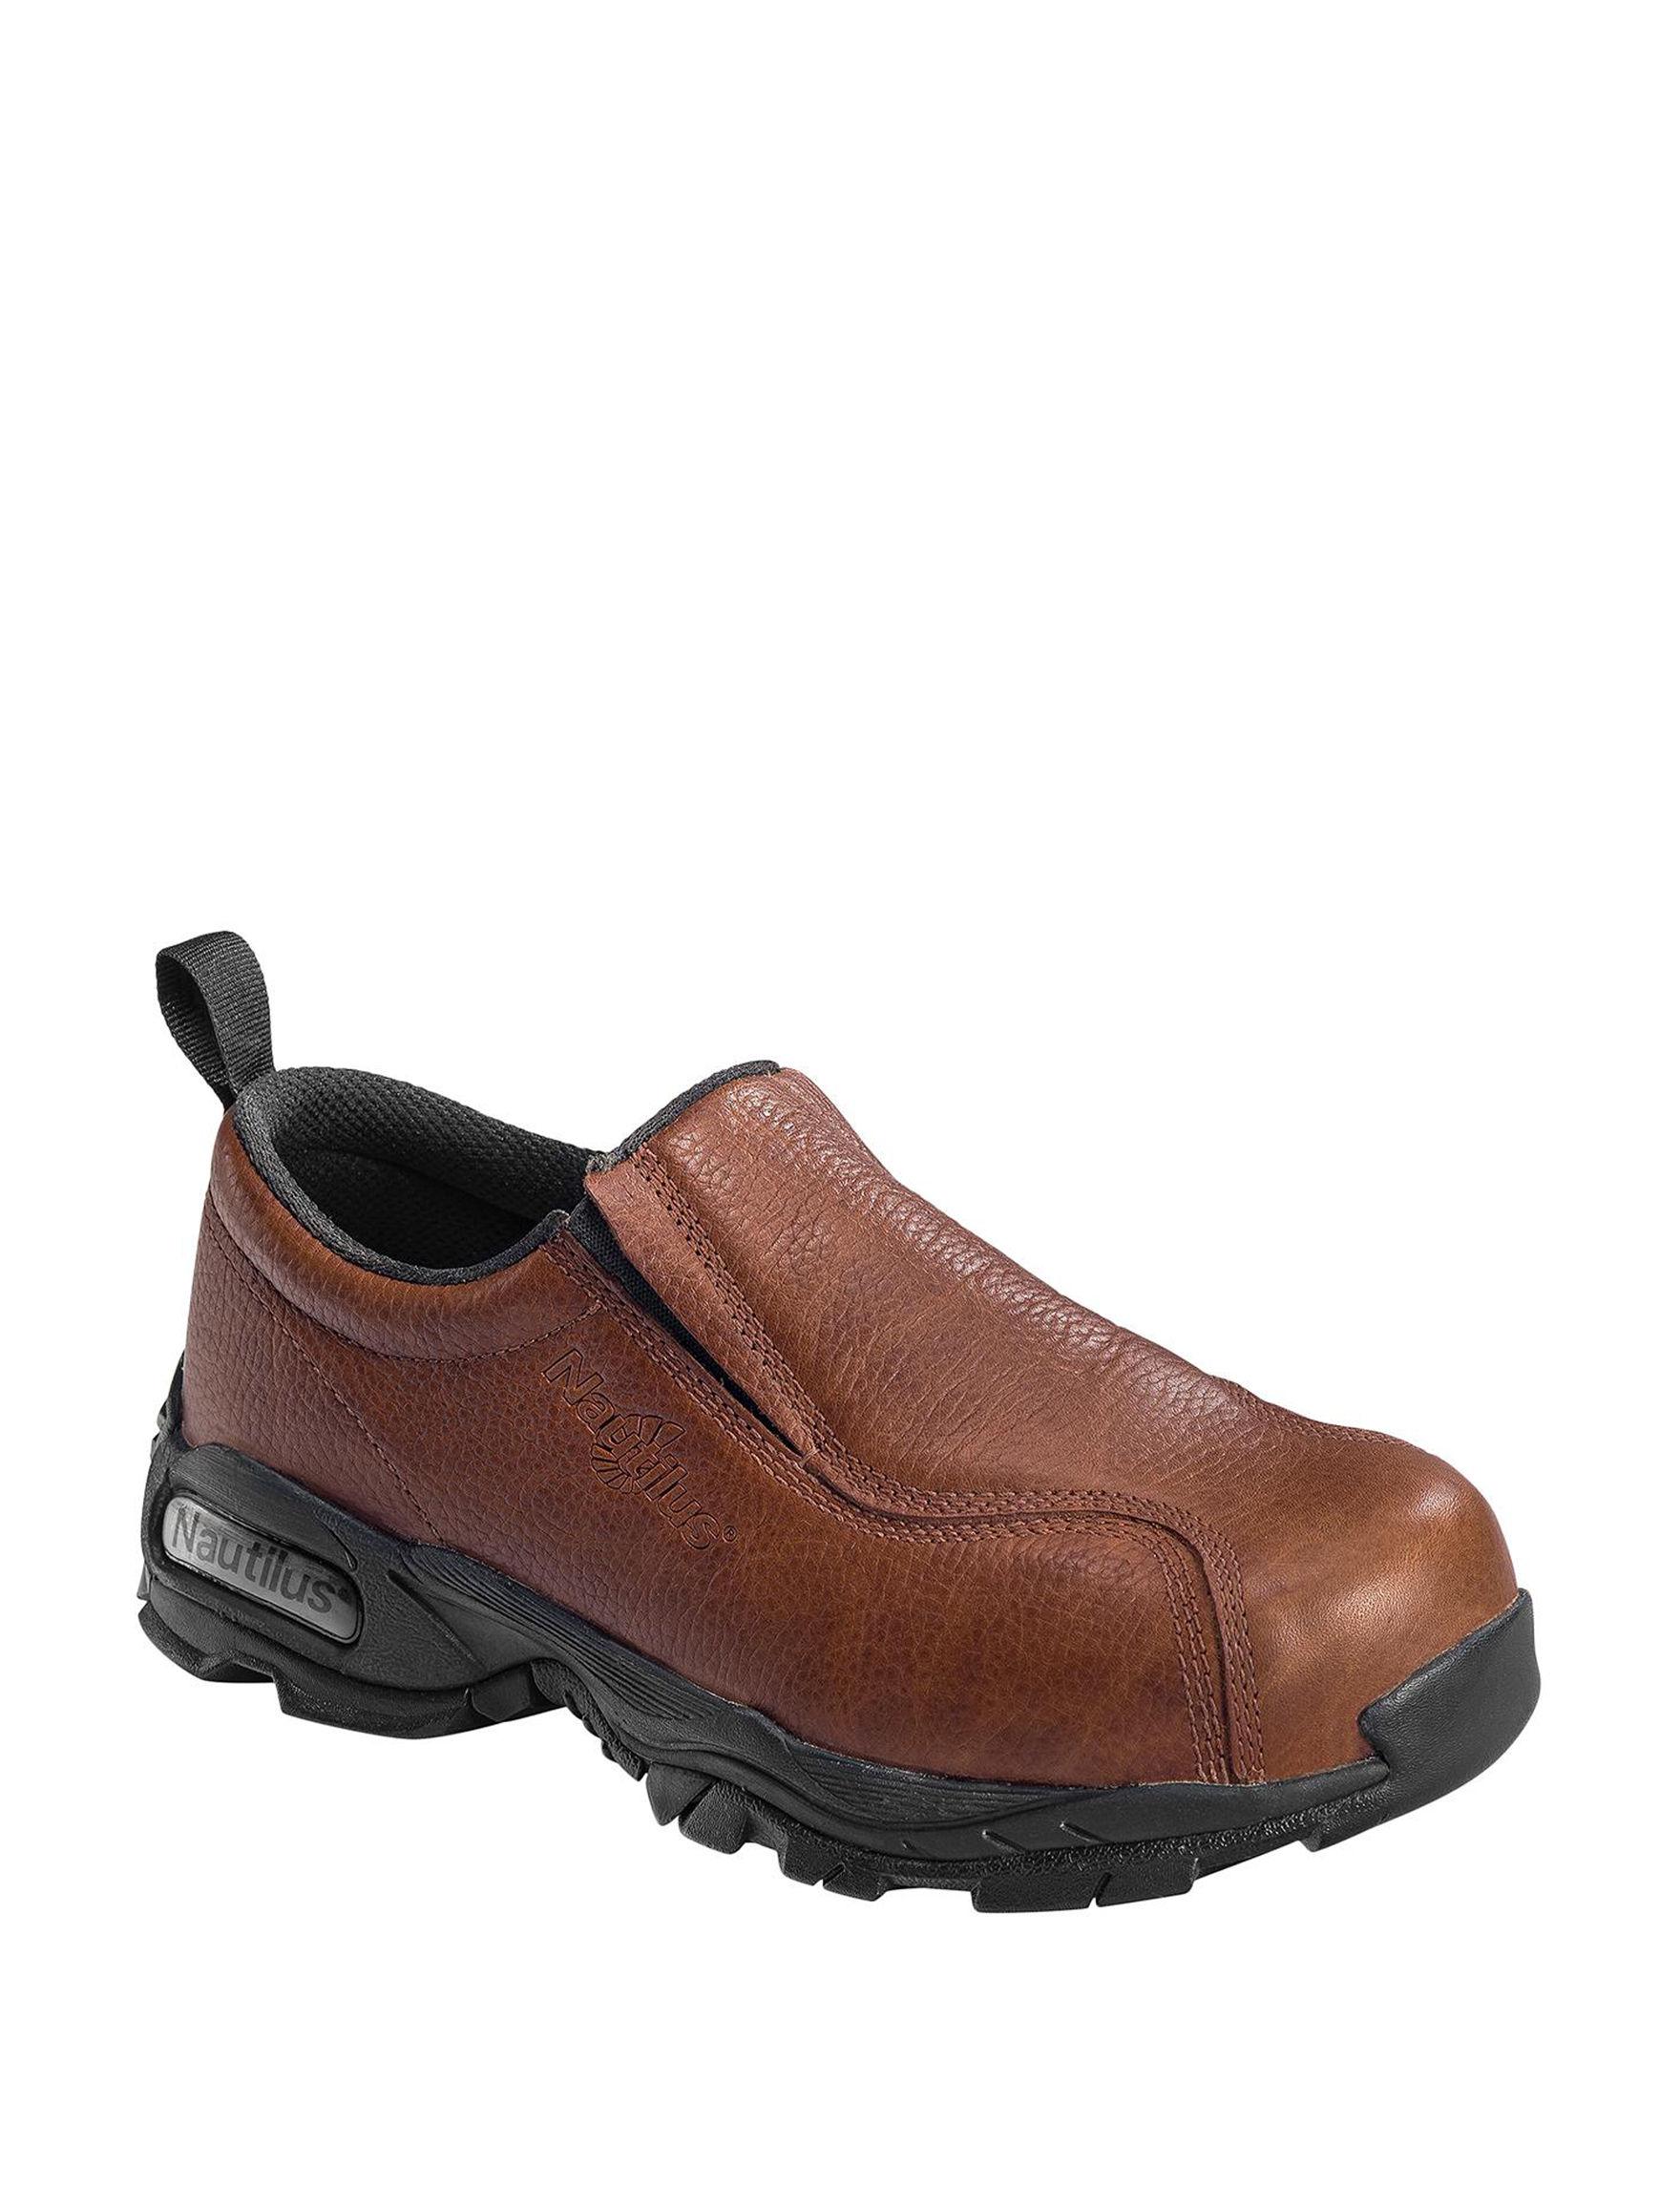 Nautilus Brown Slip Resistant